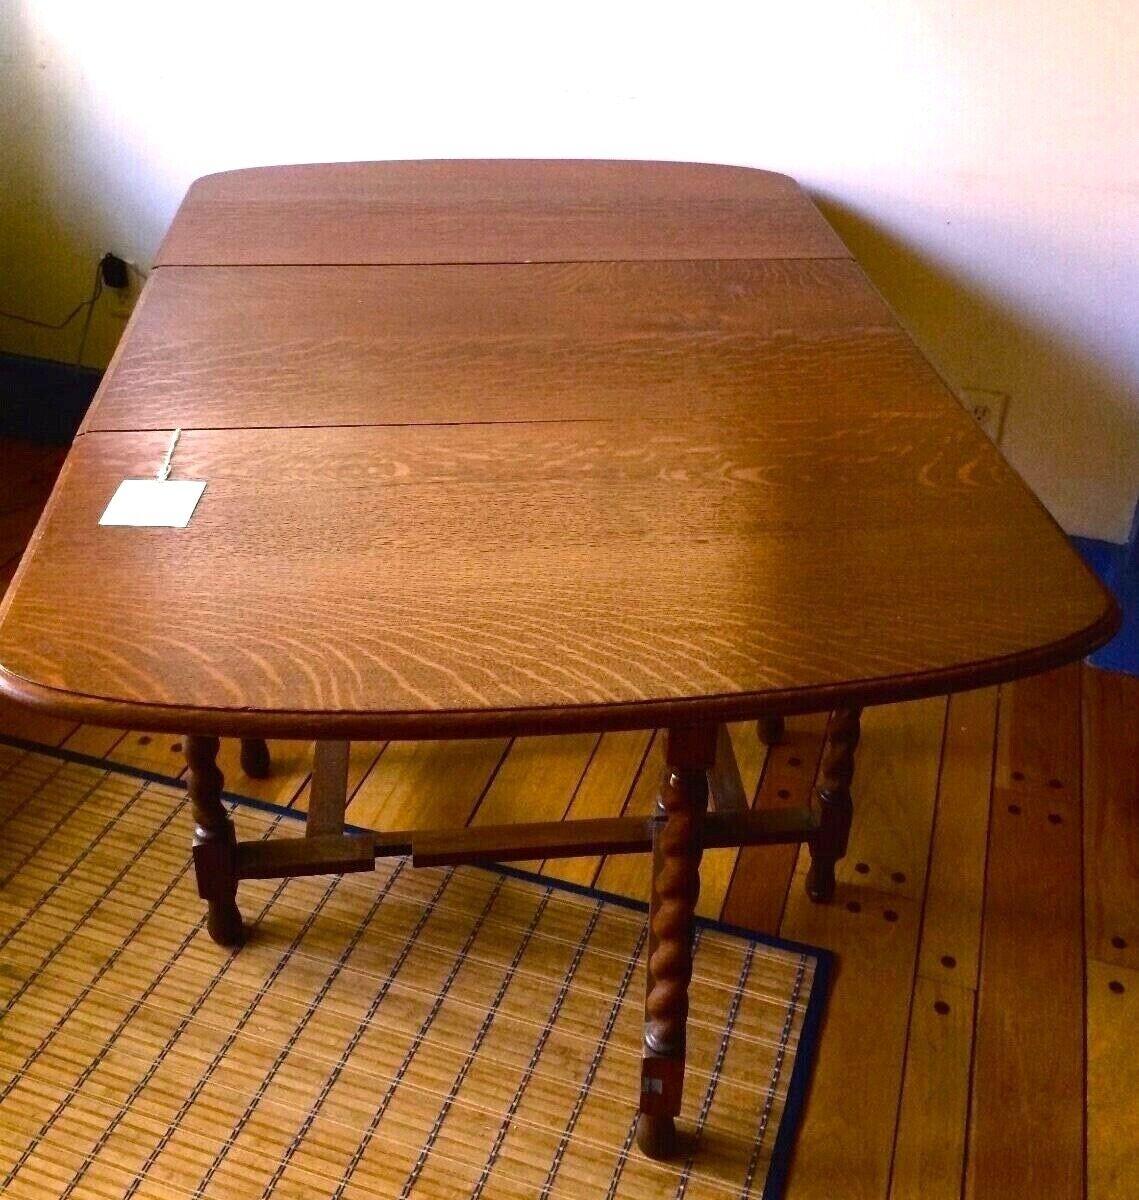 Antique Barley Twist Tiger Oak Drop Leaf Table And Chair - $999.99